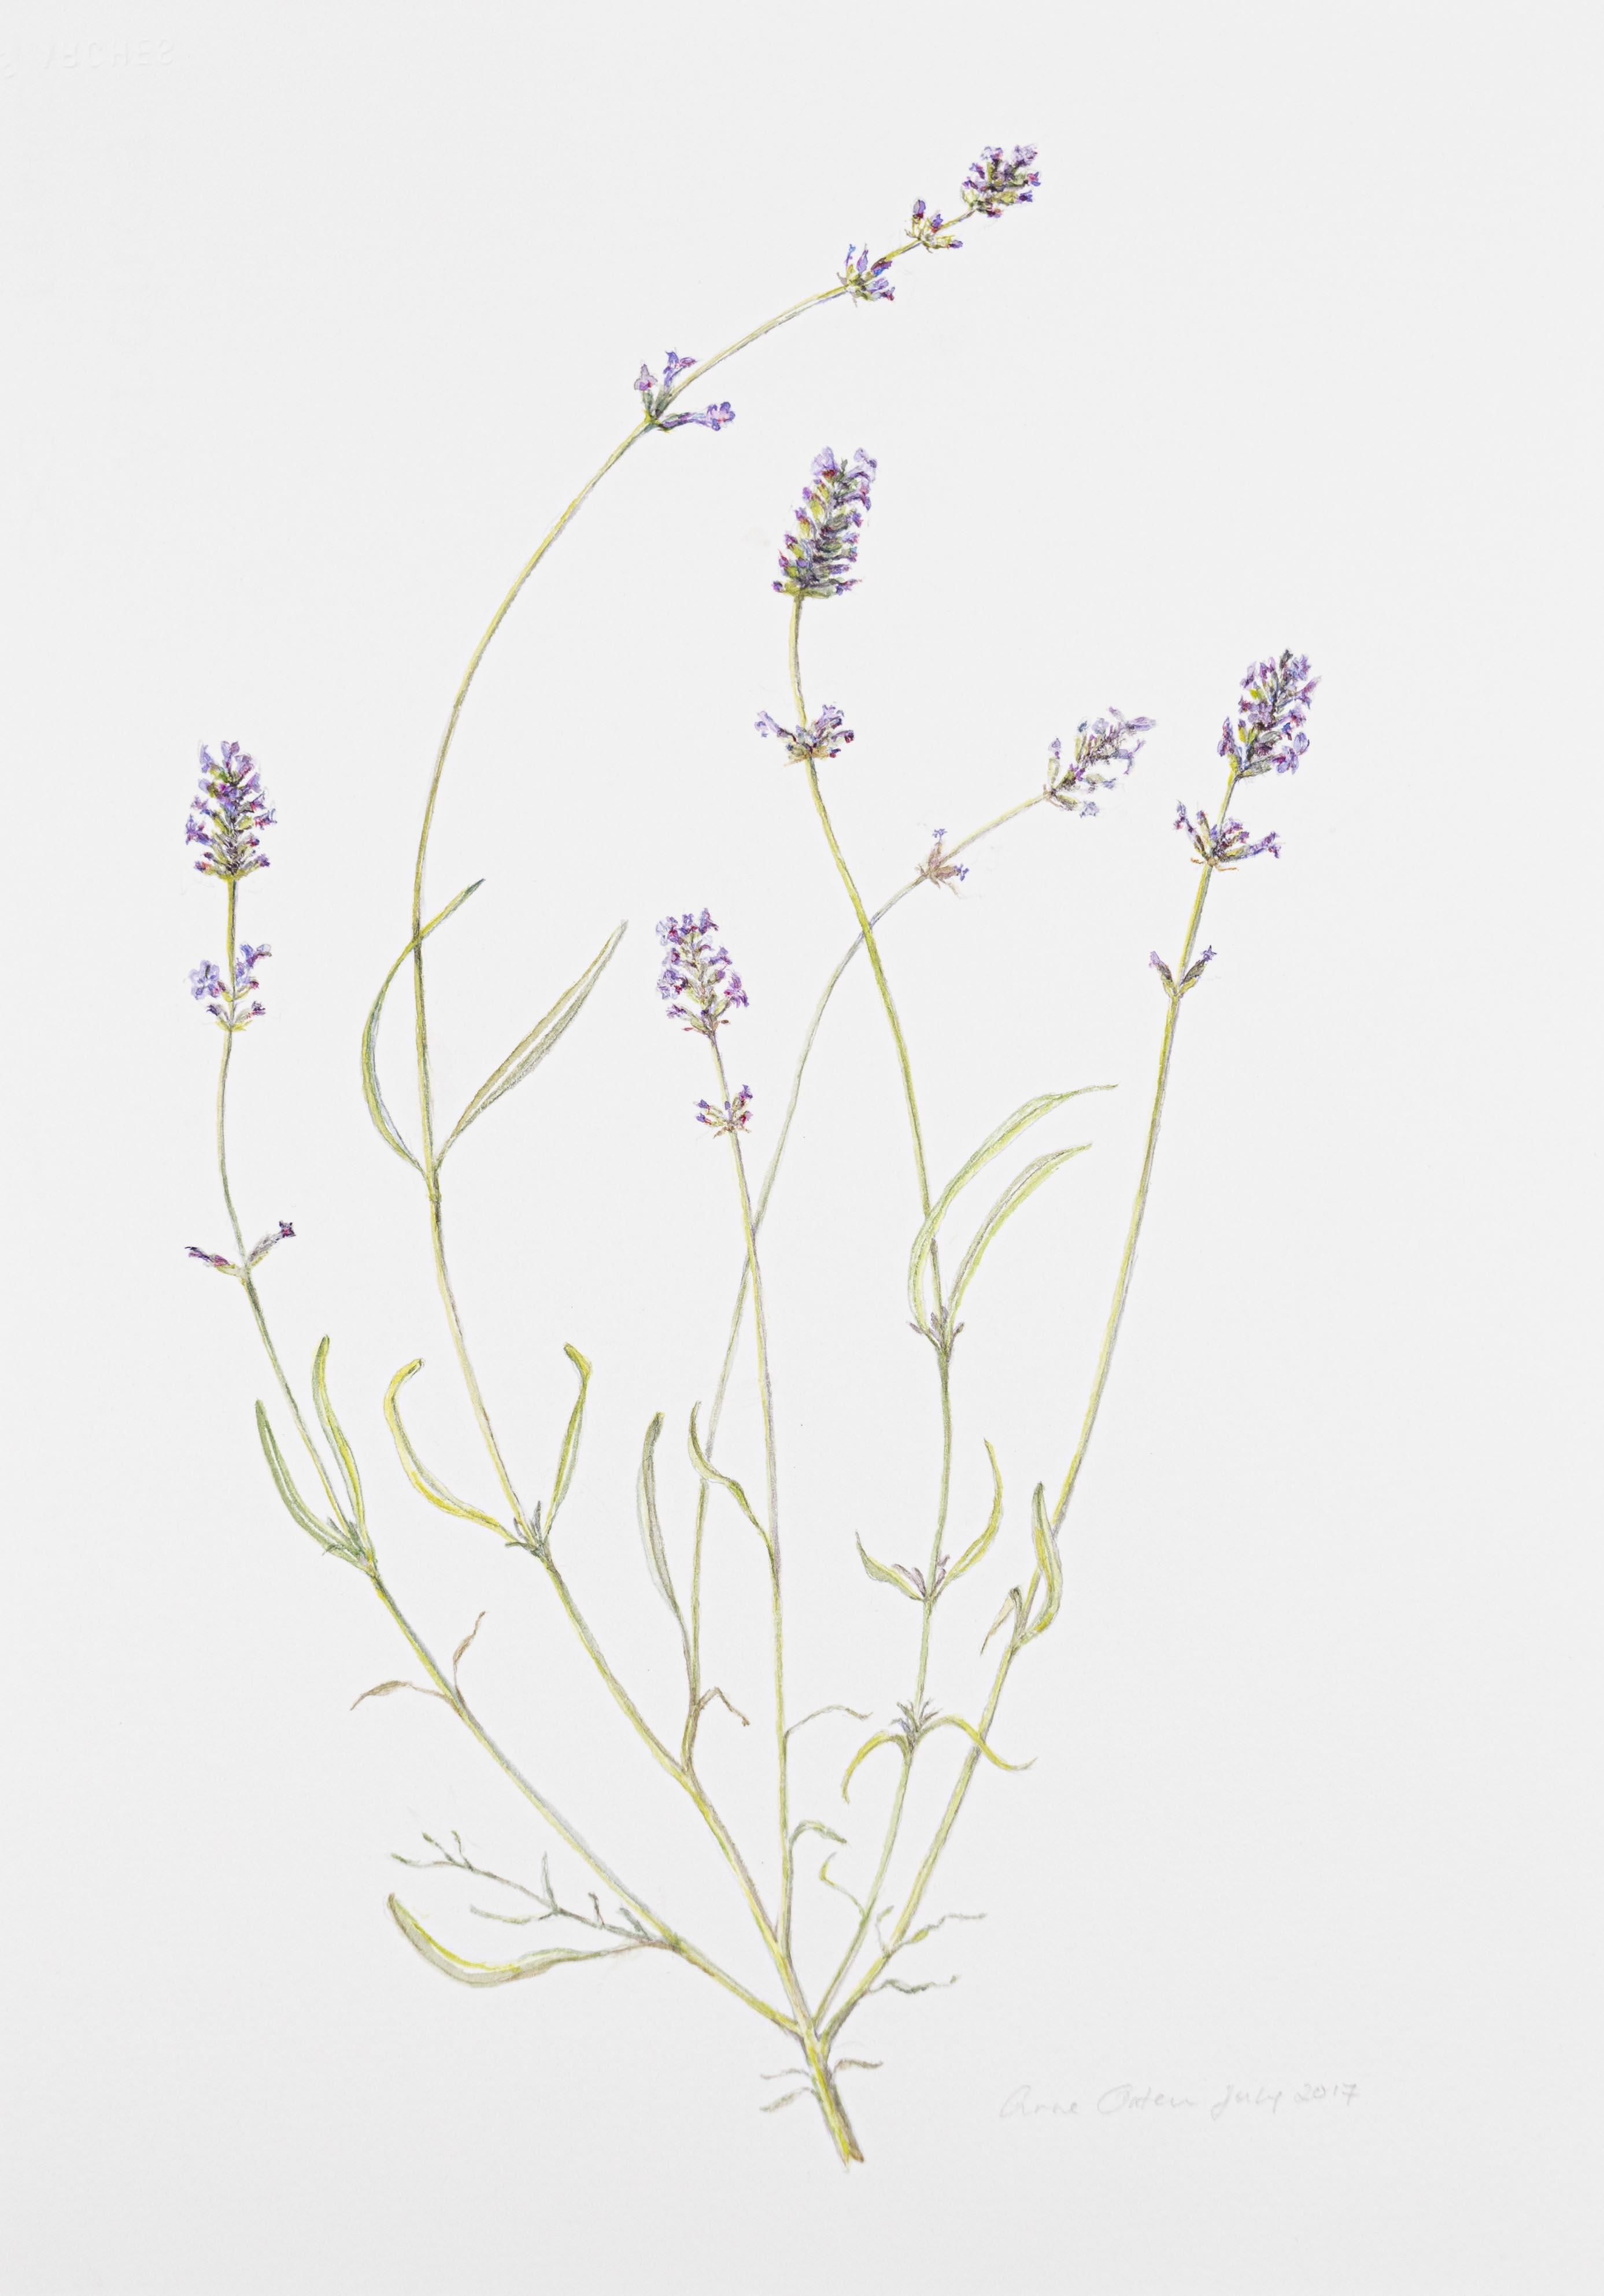 Lavendula angustifolia